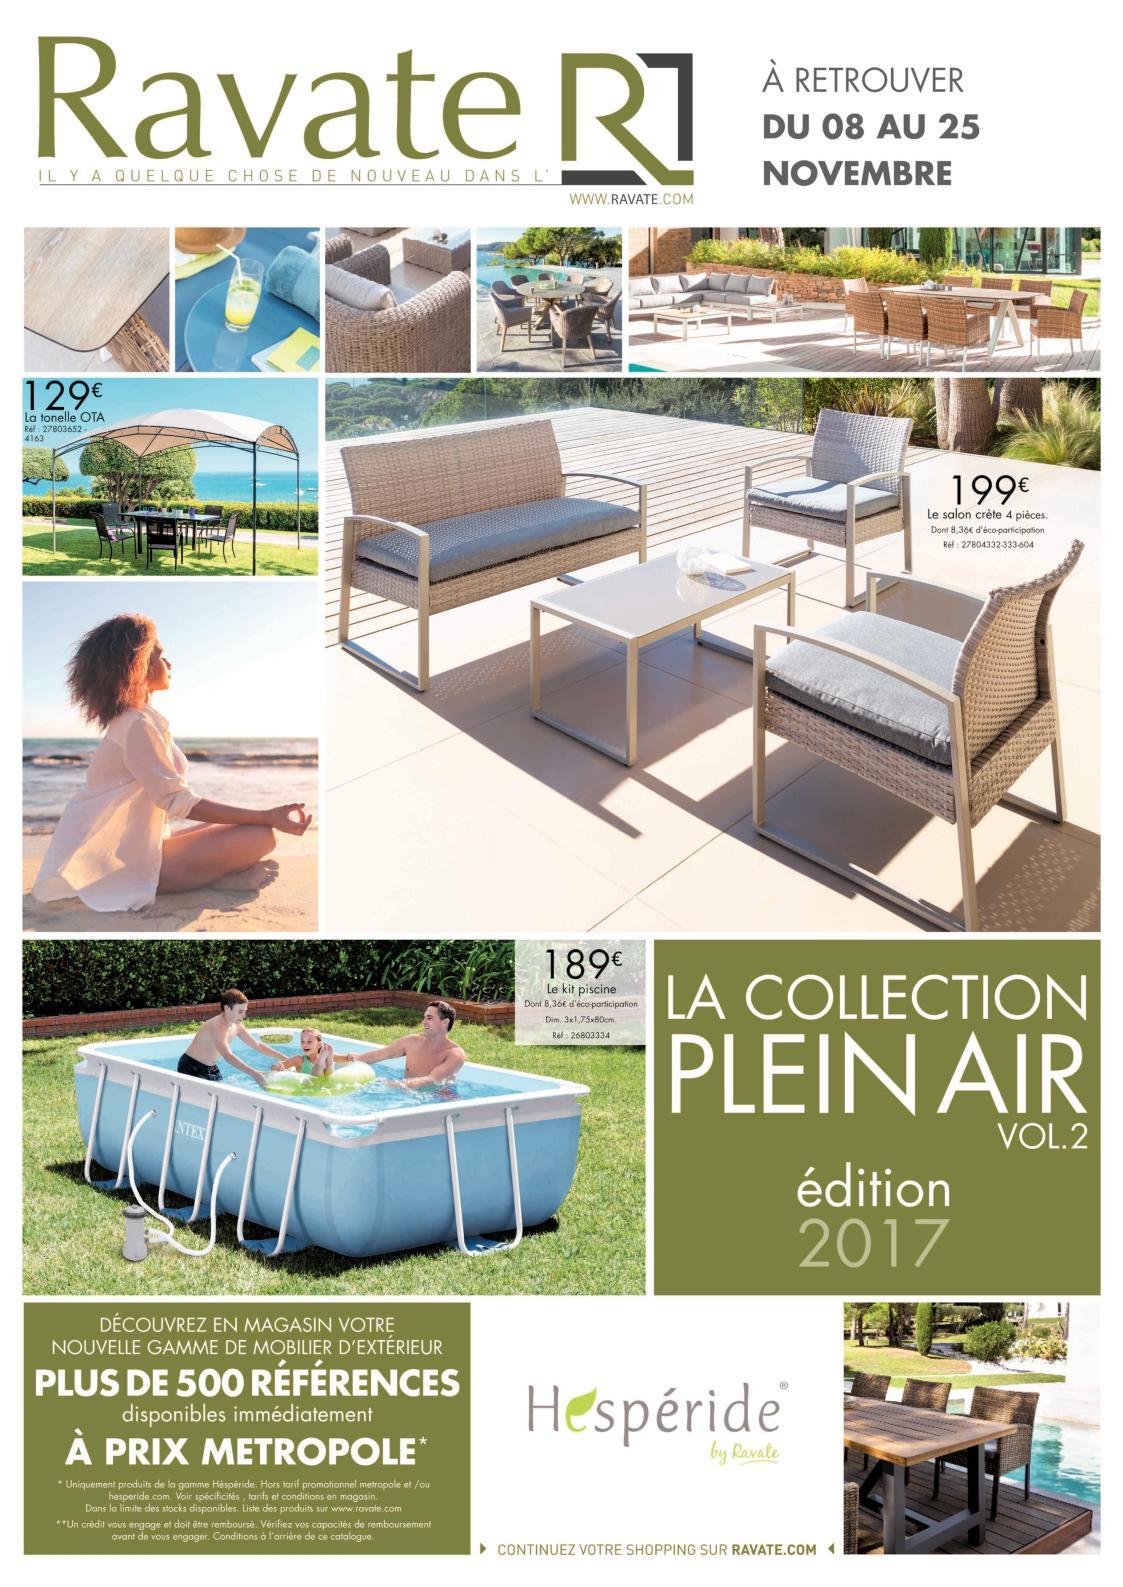 Calaméo - Catalogue Jardin Vol 2! concernant Studio De Jardin Prix